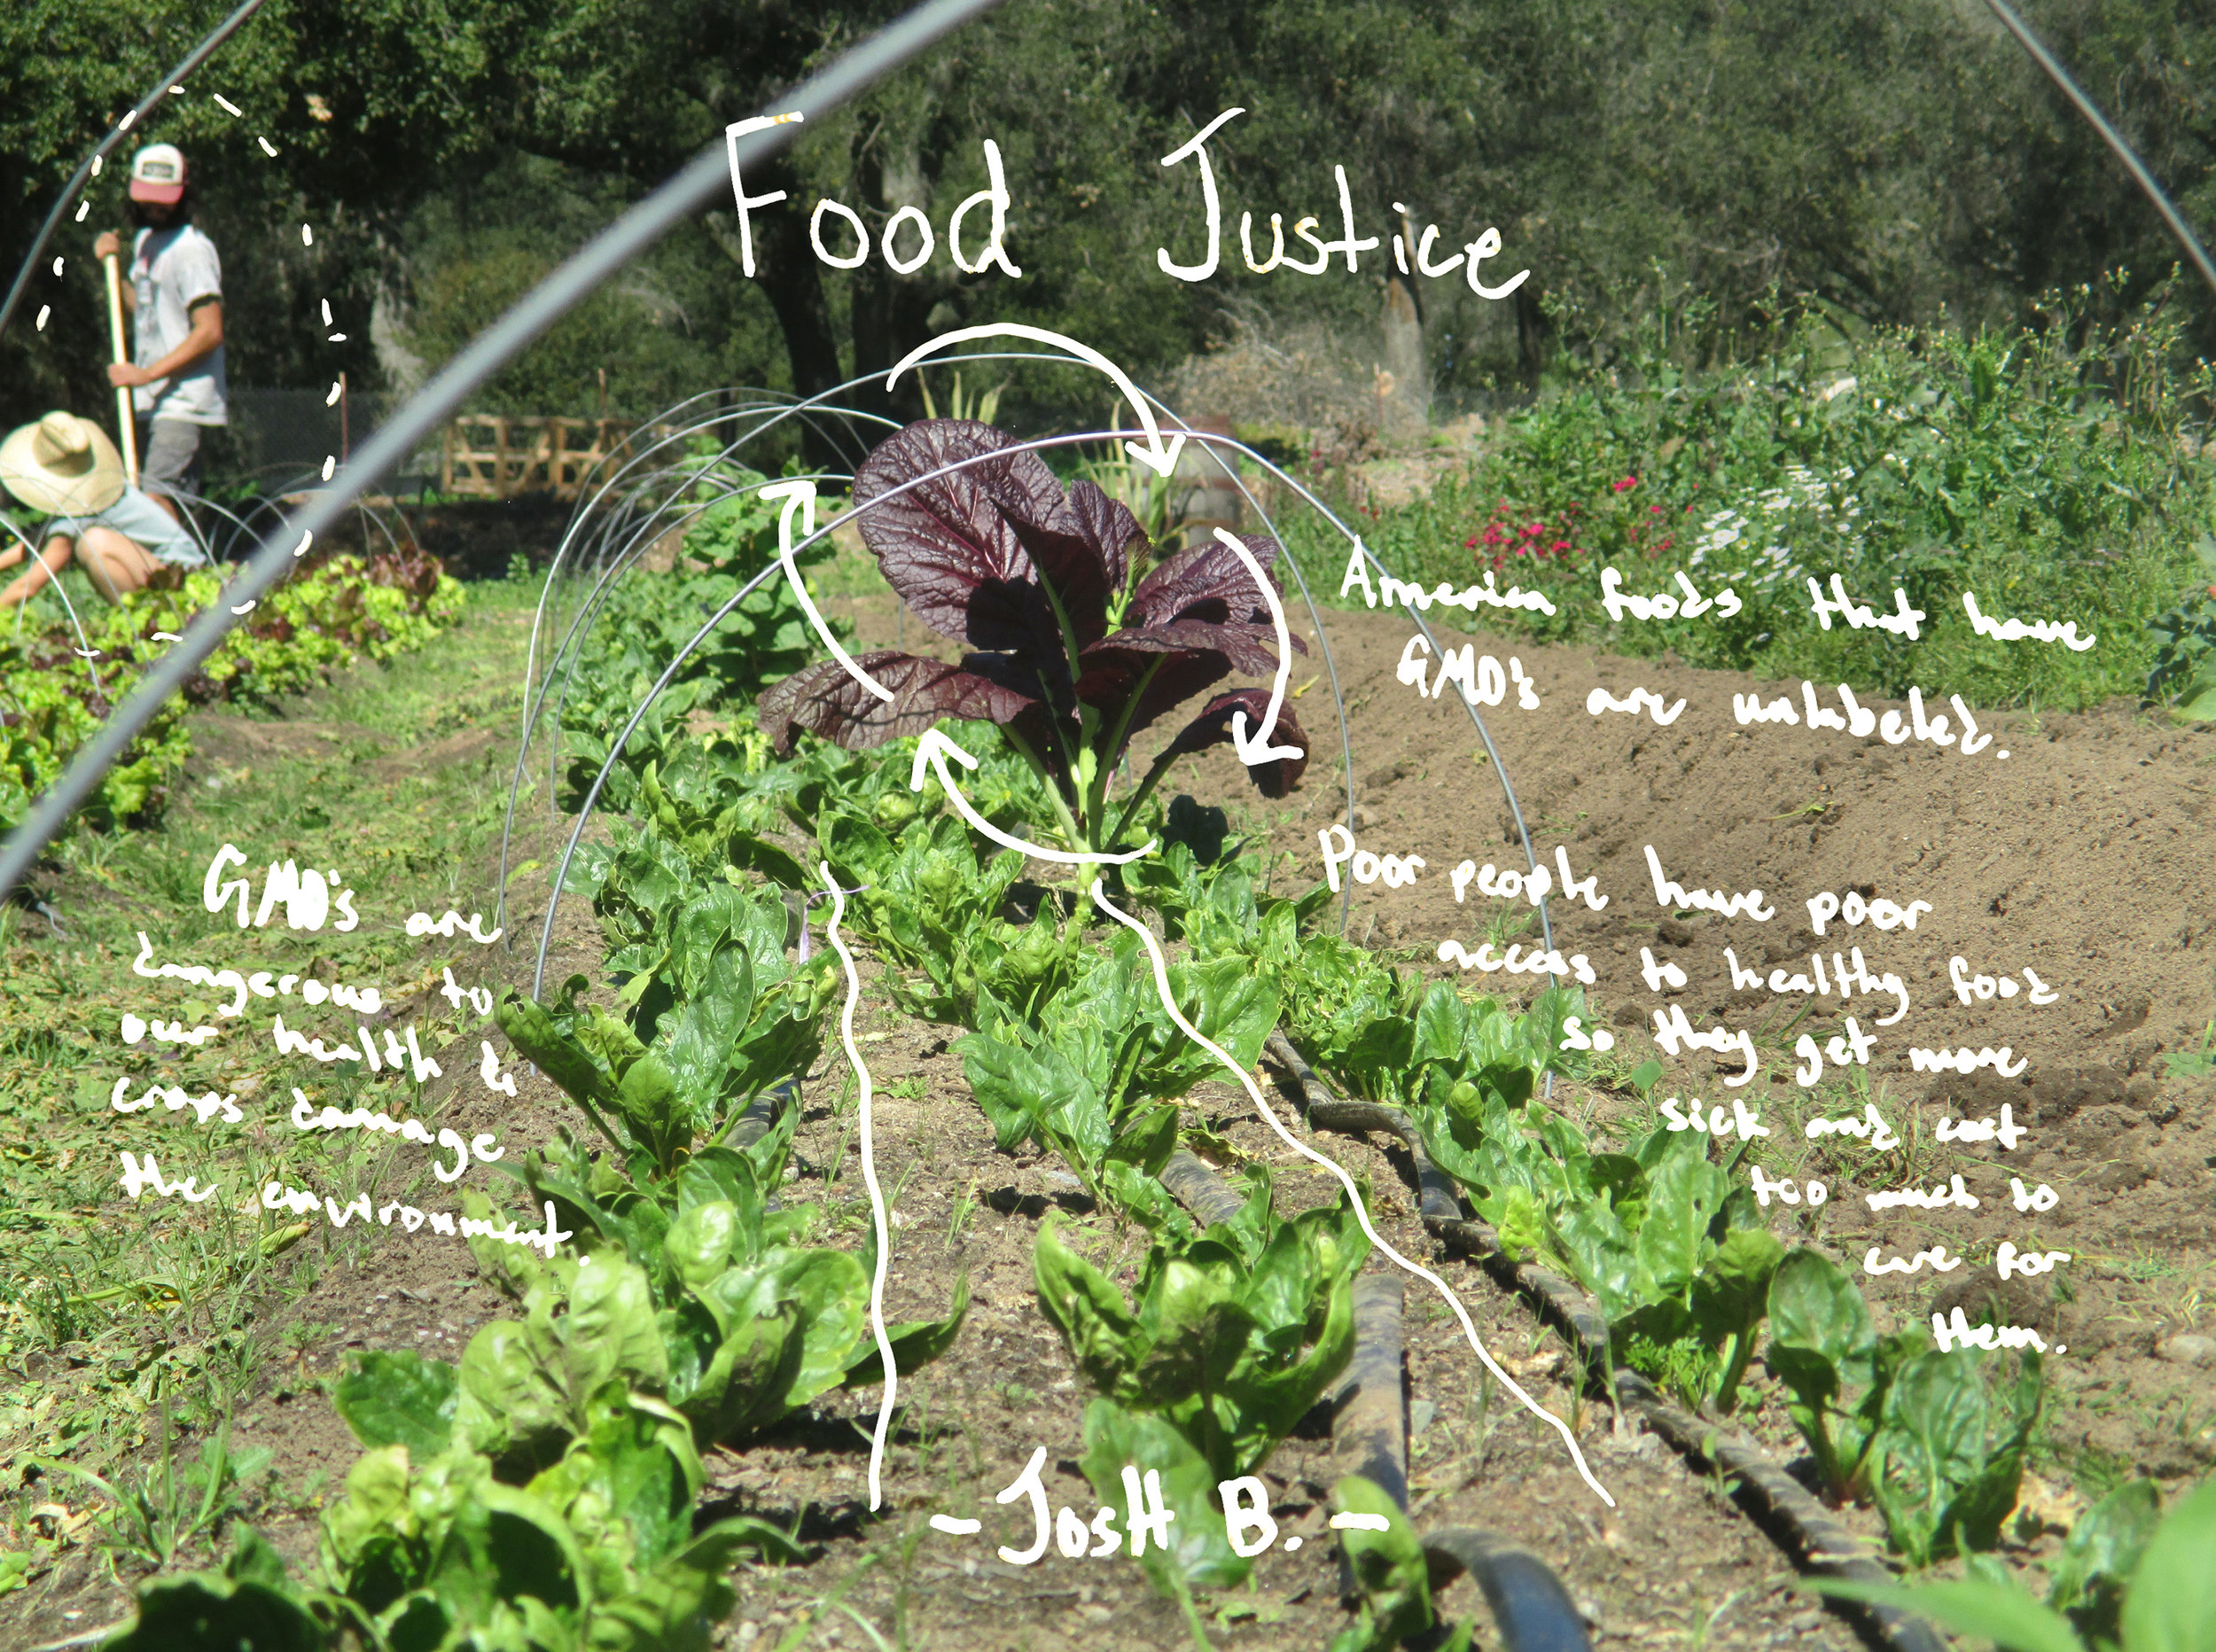 j170314_SnapShot_Sp17_foodjustice_josh.jpg